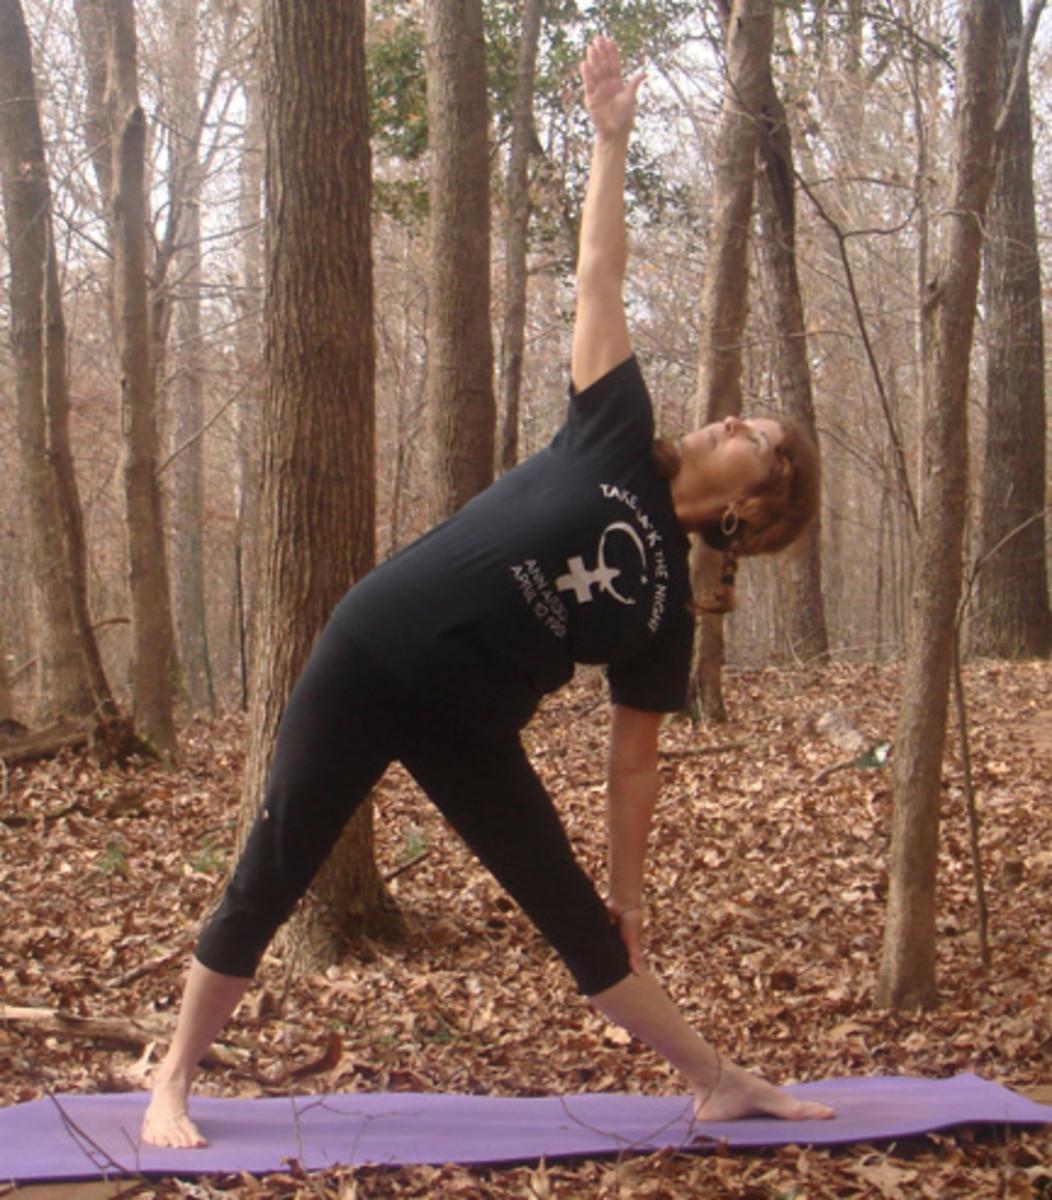 Yoga student in trikonasana, triangle pose